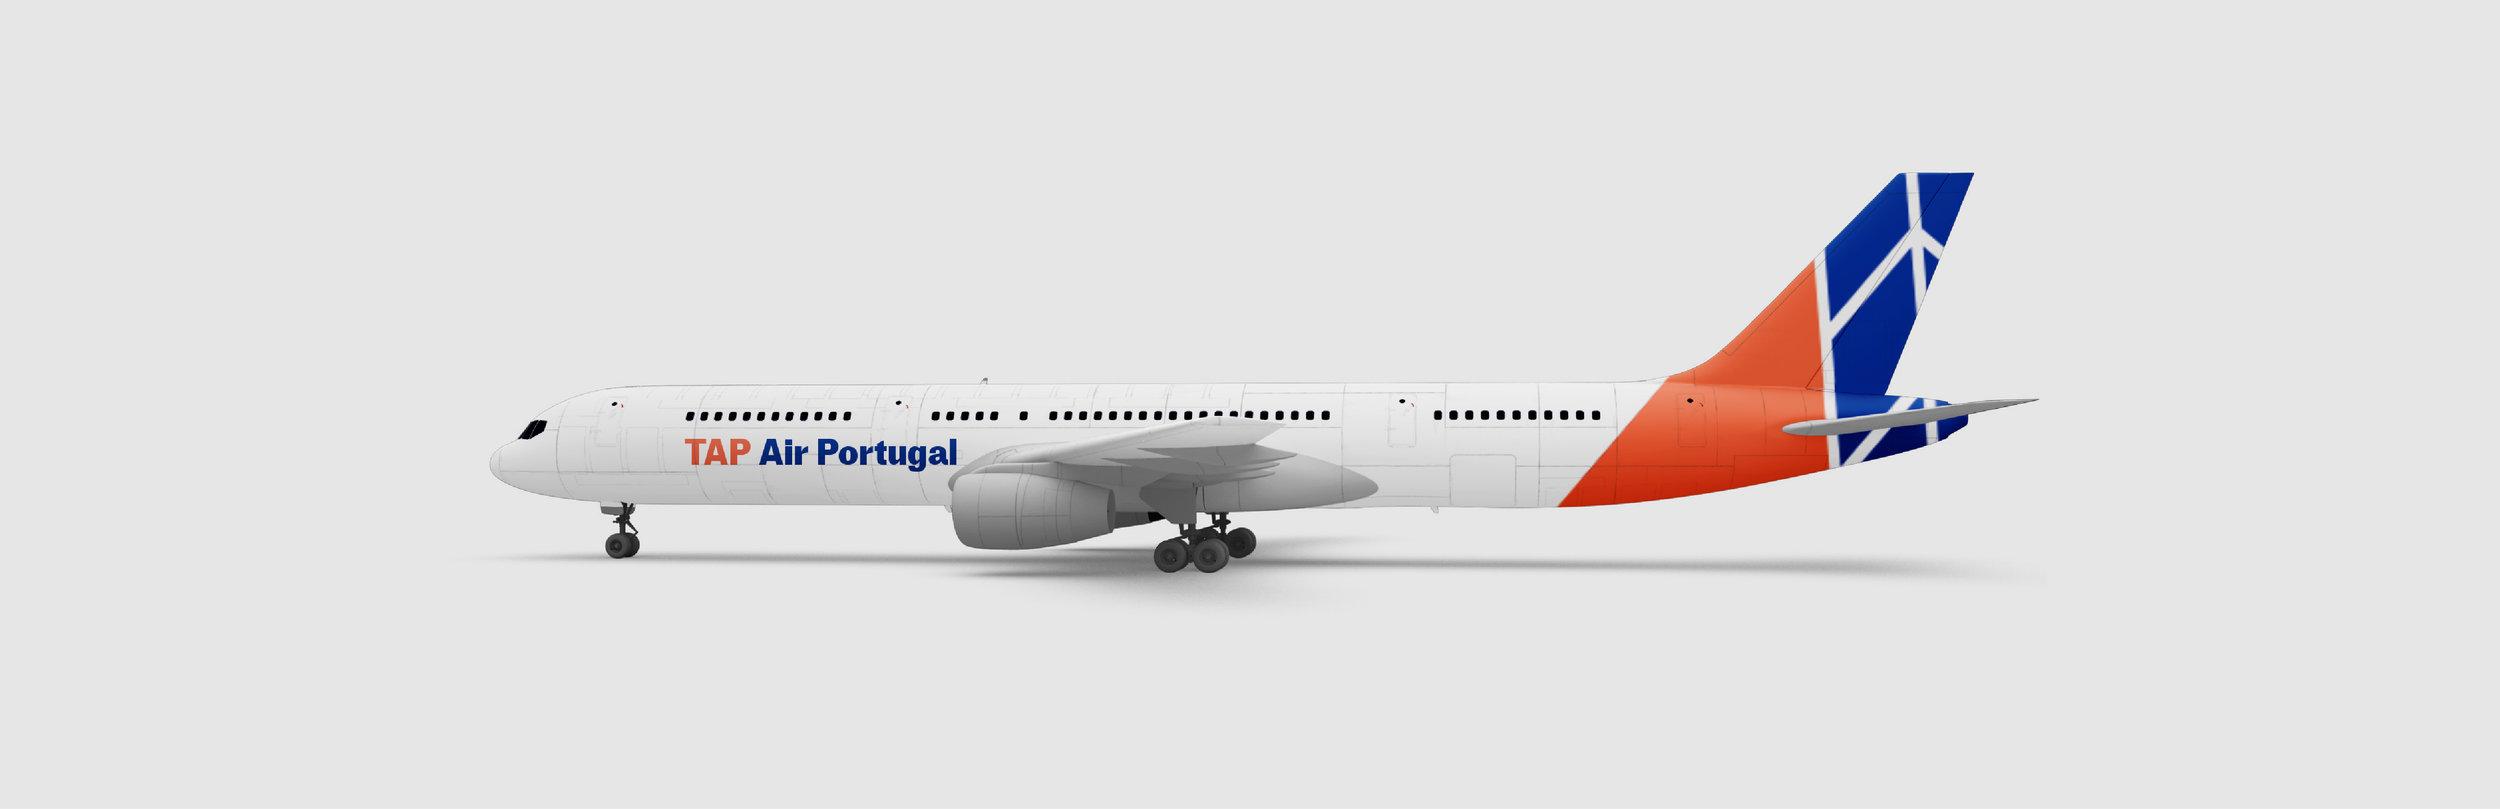 plane-17.jpg